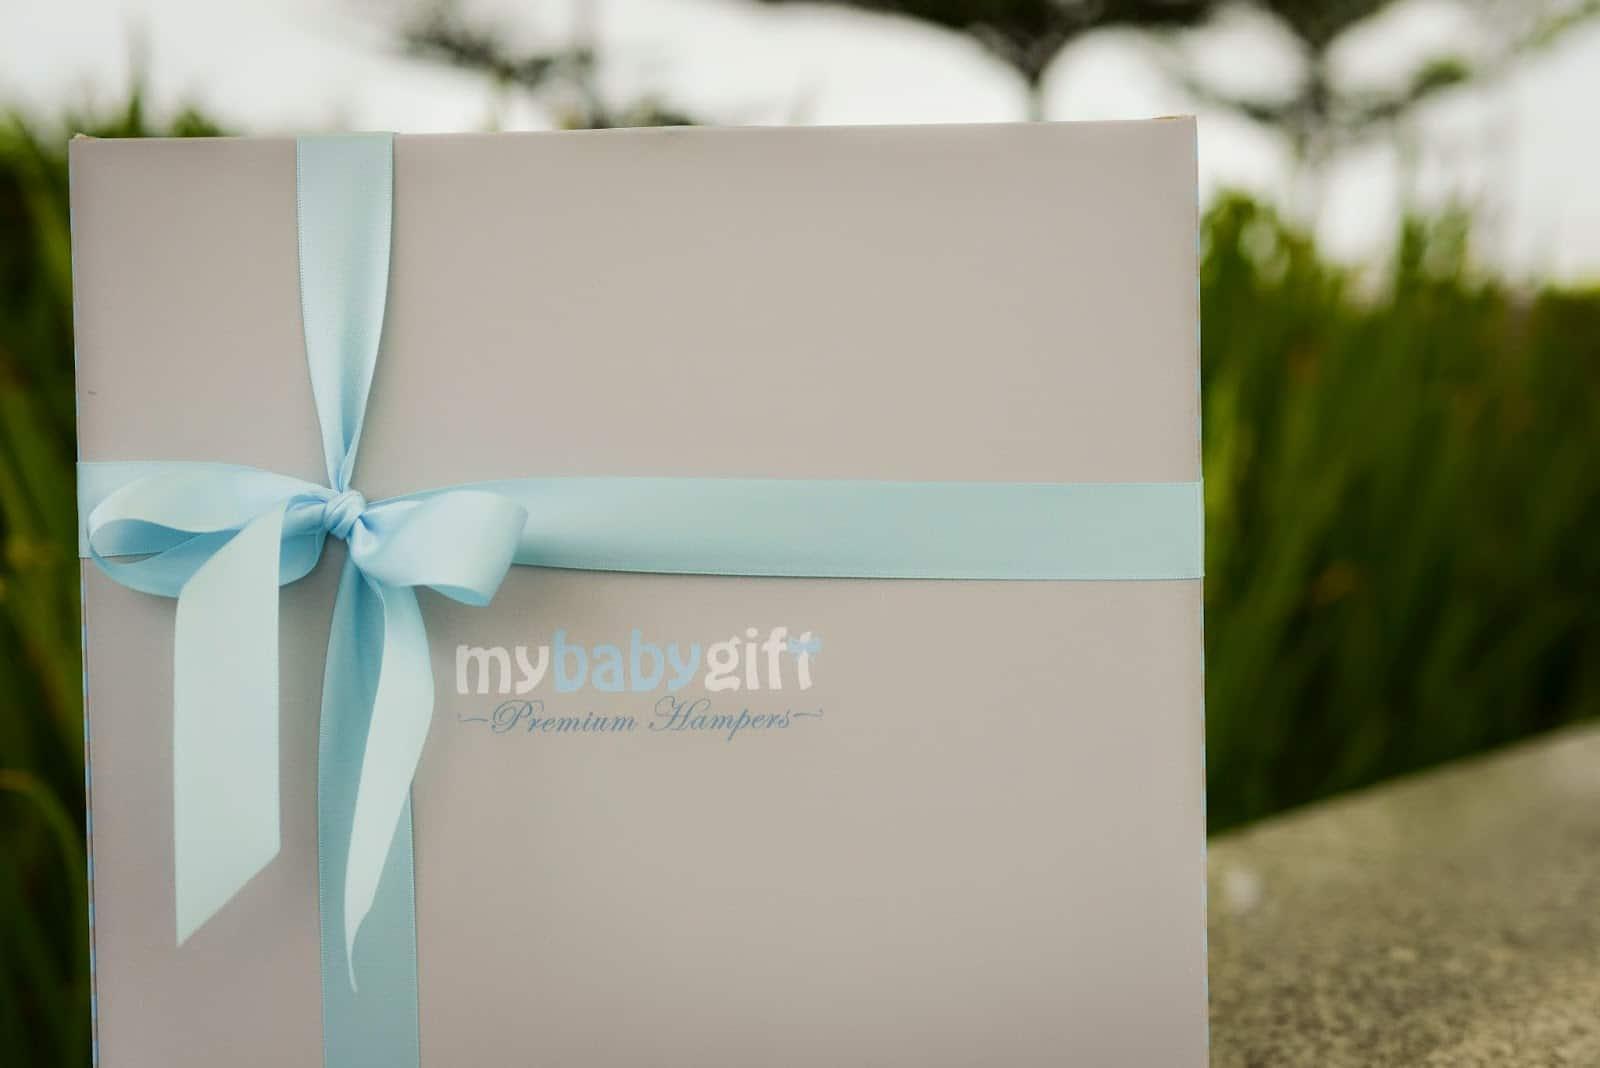 Stylish, elegant gifts in a box